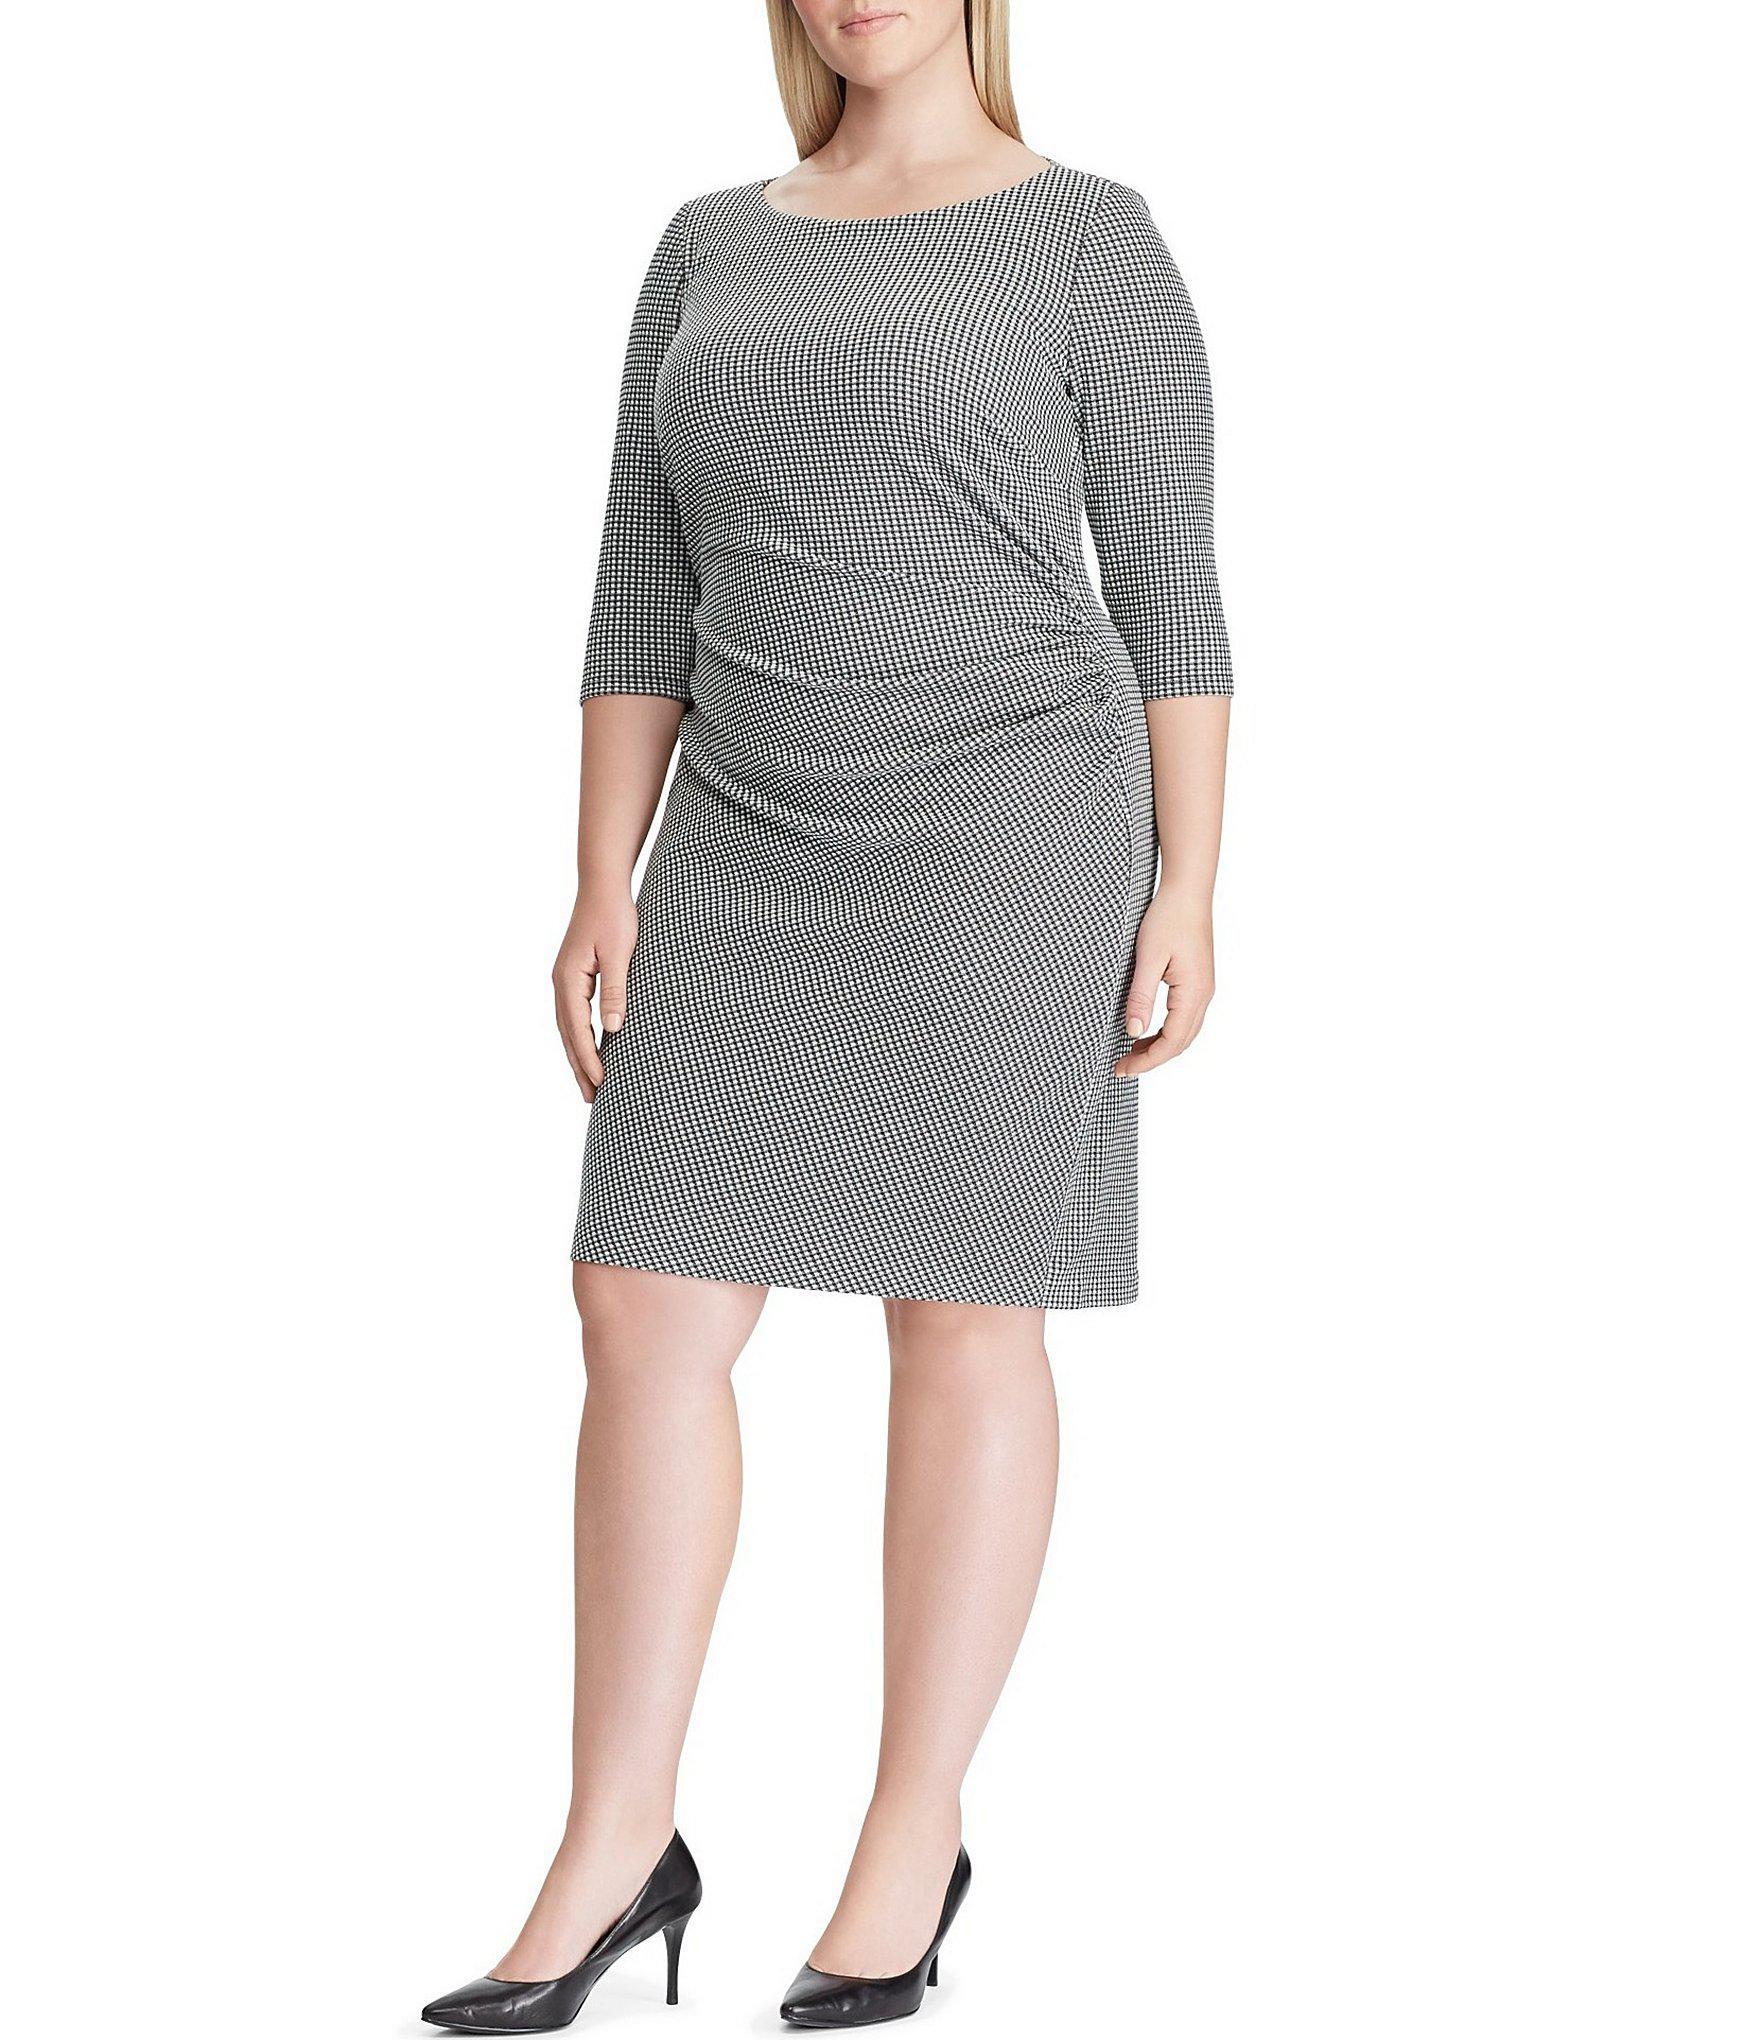 02301b46d2 Plus Size Cocktail Dresses At Dillards - Data Dynamic AG